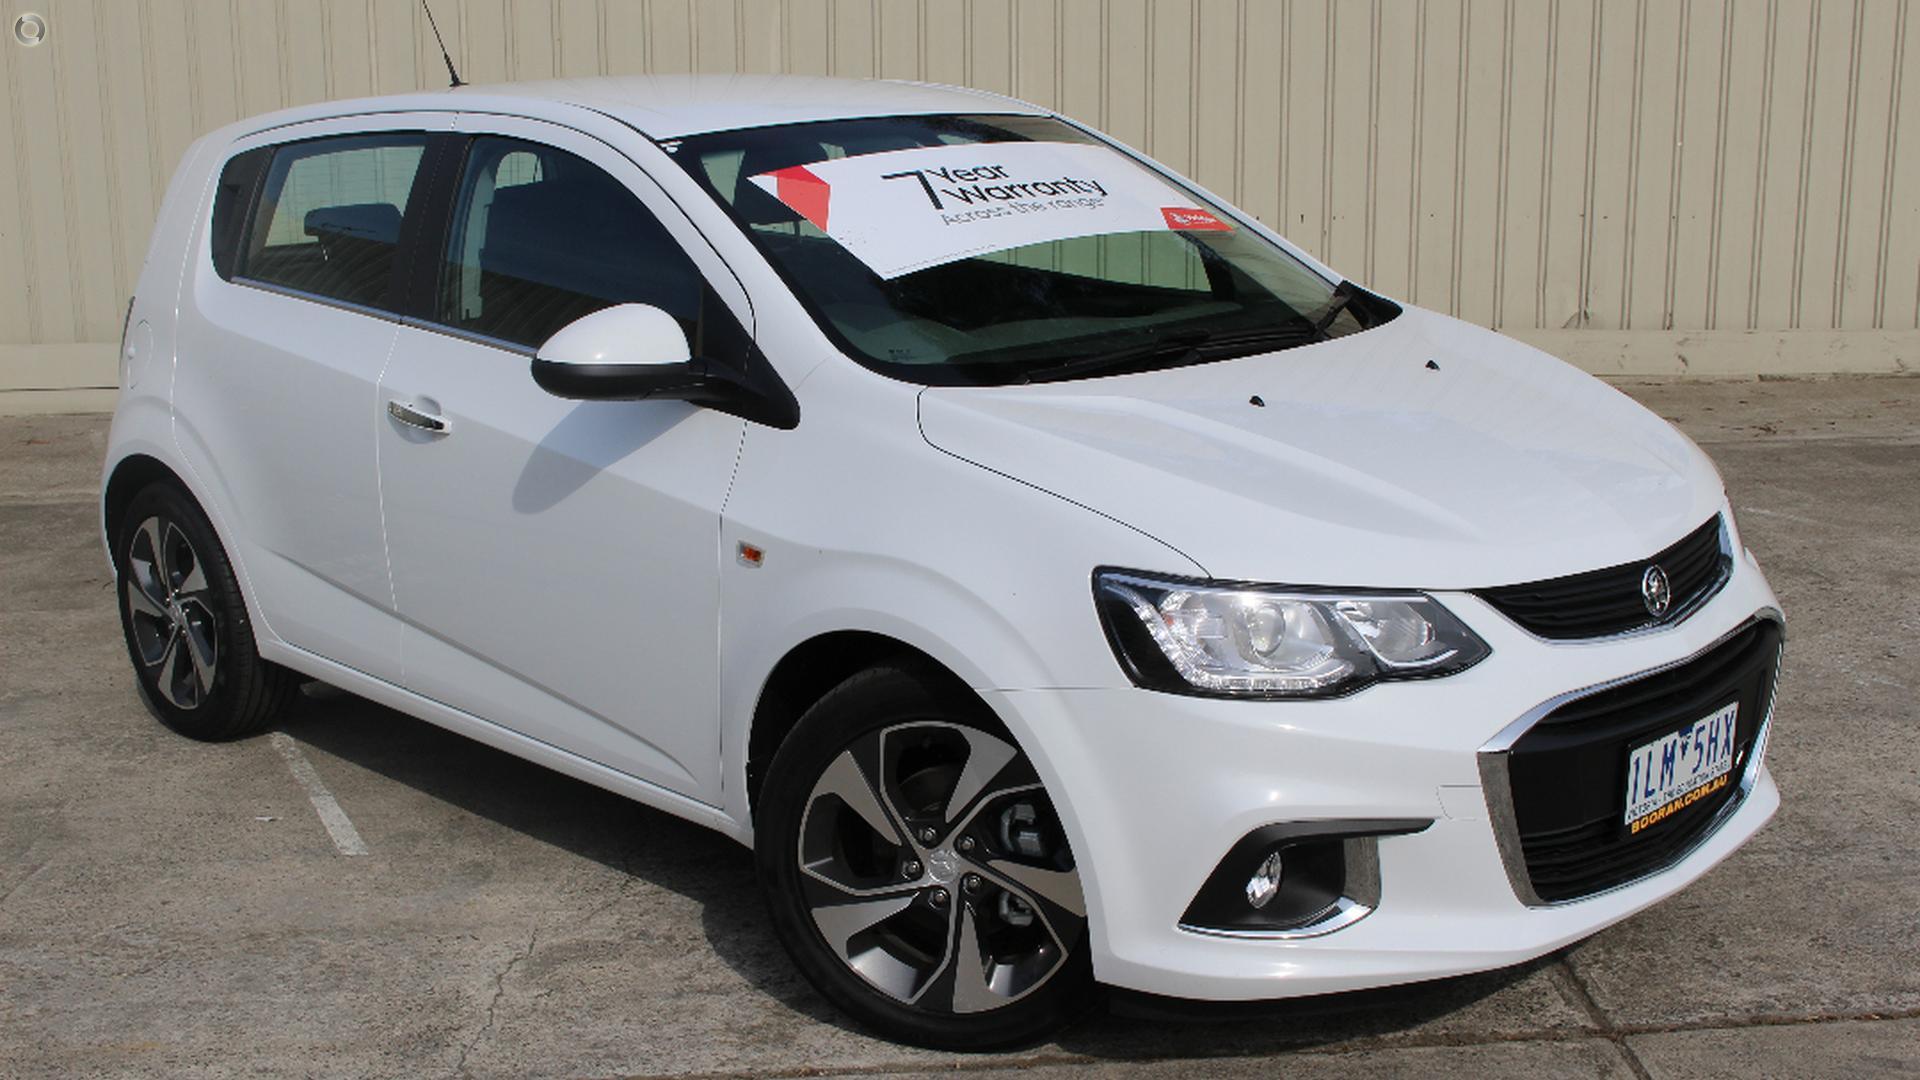 2016 Holden Barina LT TM